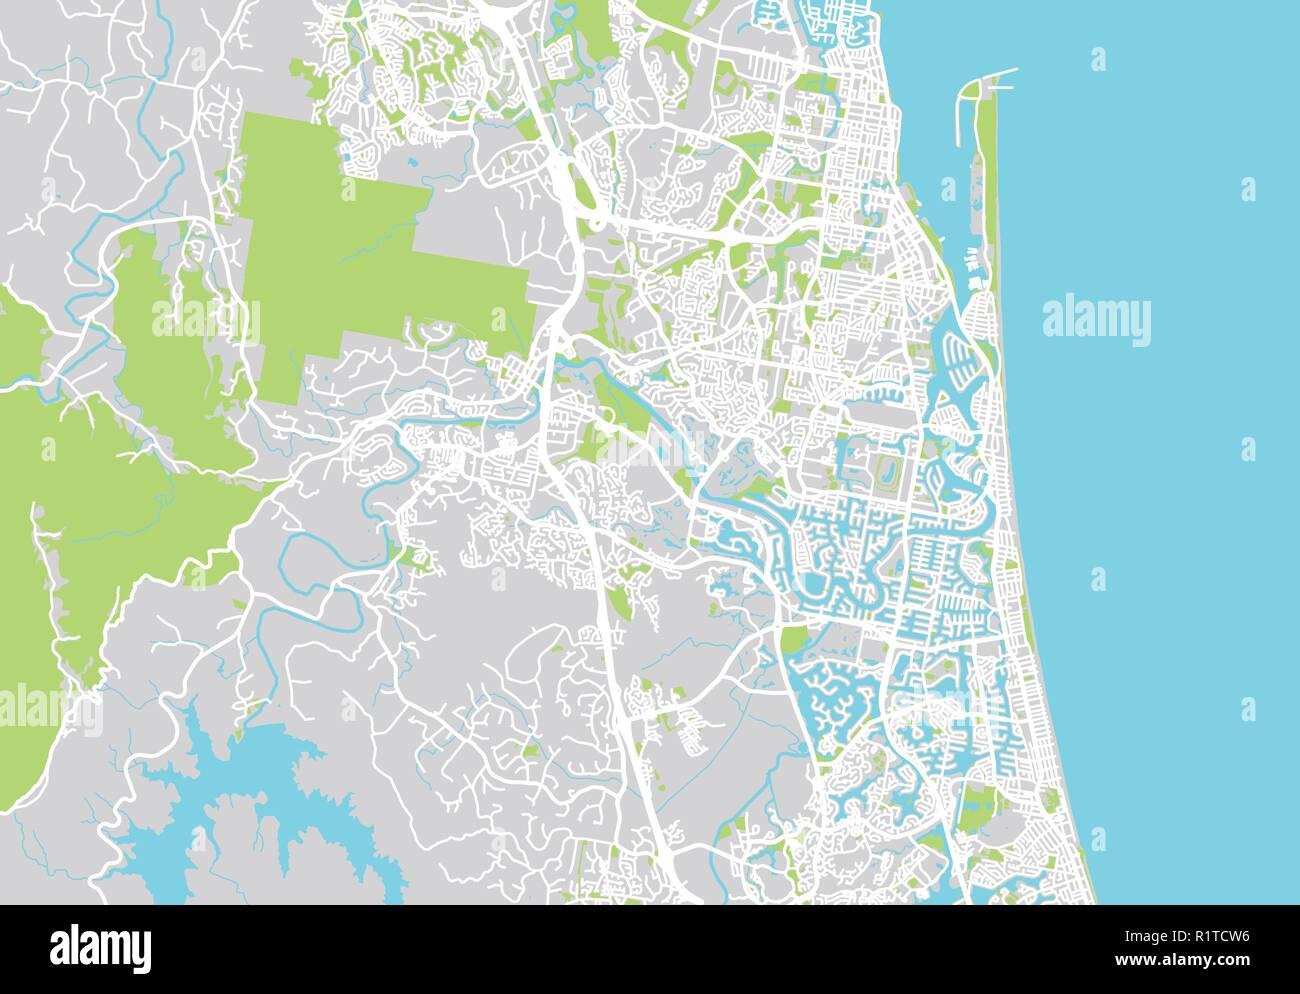 Australia Map Gold Coast.Urban Vector City Map Of Gold Coast Australia Stock Vector Art